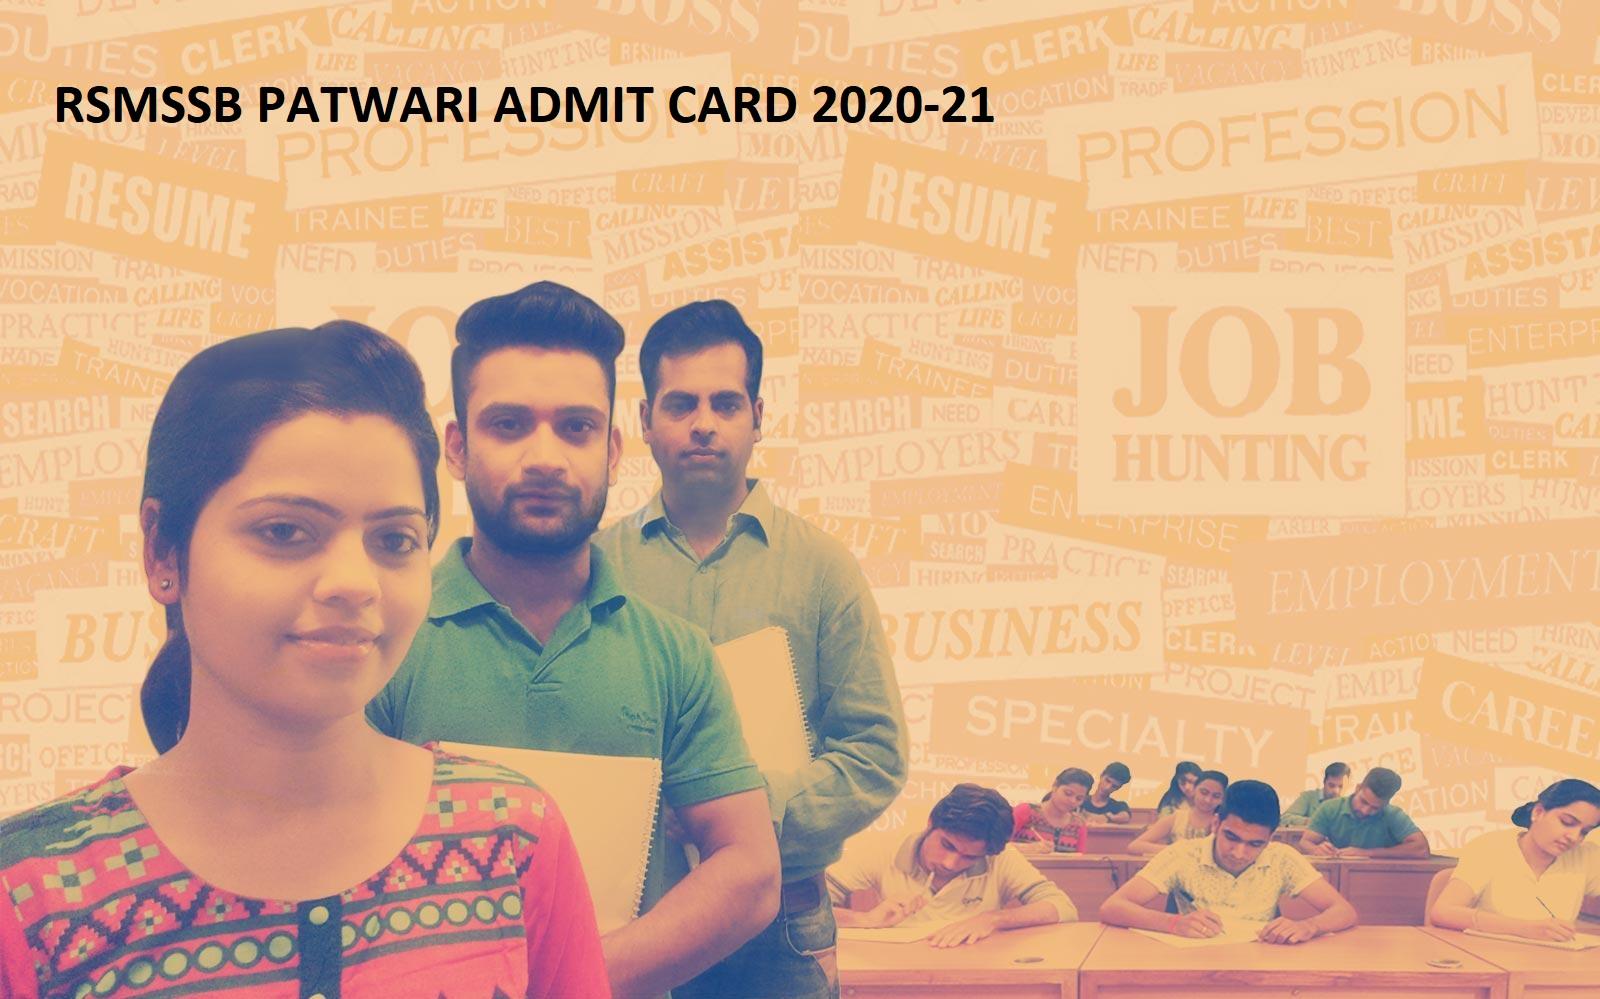 Rajasthan 4207 पटवारी Exam प्रवेश पत्र 2020-21 - RSMSSB Patwari Admit Card 2020 Download Now 1